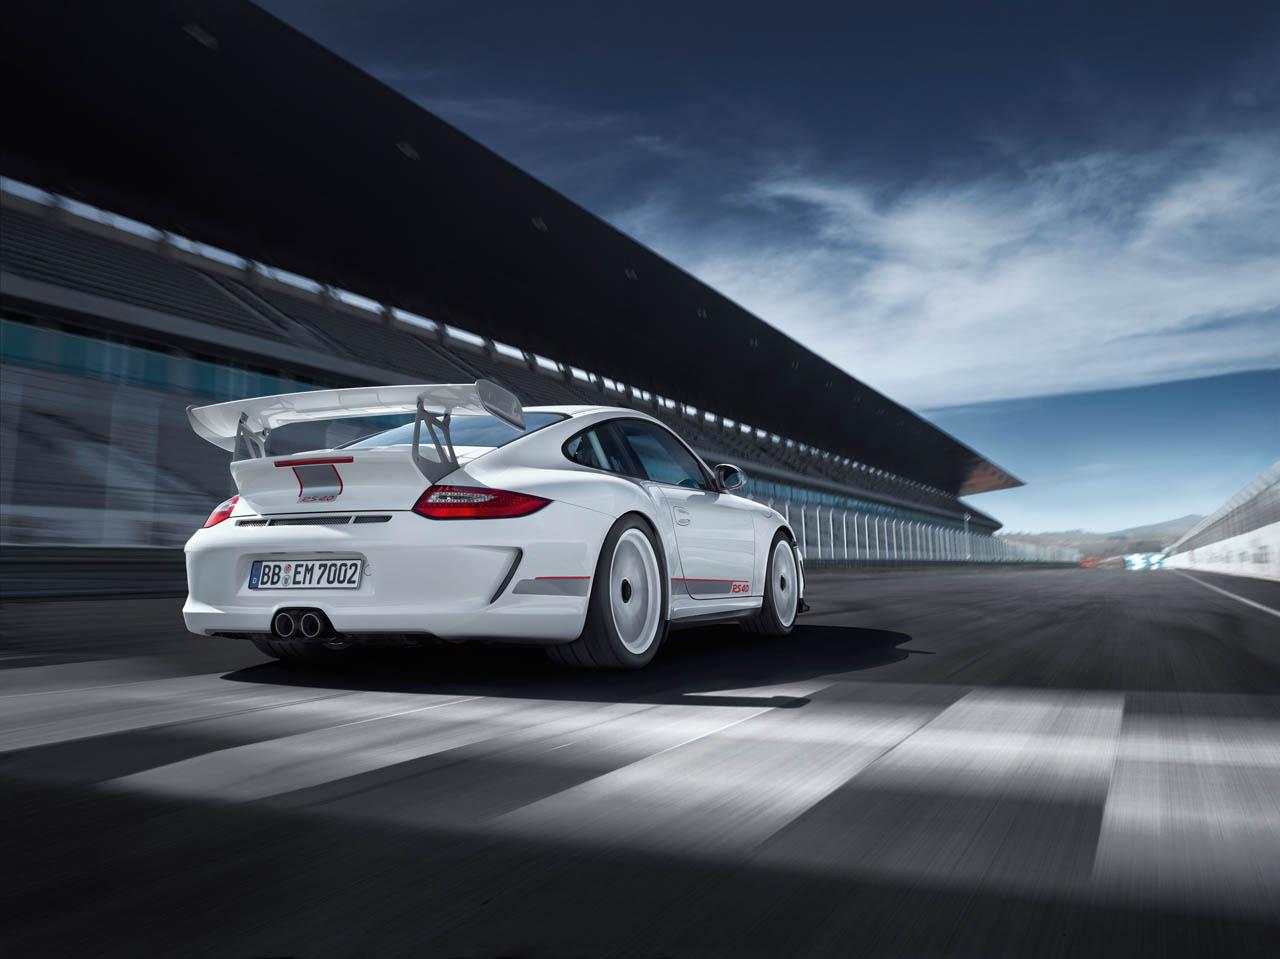 Limited Edition Porsche 911 GT3 RS 4.0 revealed! – BenAutobahn on laferrari on track, mclaren p1 on track, lotus exige on track, audi r8 on track, bugatti veyron on track, maserati mc12 on track, mclaren f1 on track, ford gt40 on track, hyundai genesis coupe on track, pagani zonda on track, lamborghini aventador on track, jeep wrangler on track, ford gt on track, lamborghini diablo on track, dodge viper on track, ferrari testarossa on track, hennessey venom gt on track, lamborghini gallardo on track, lamborghini sesto elemento on track, ferrari mondial on track,